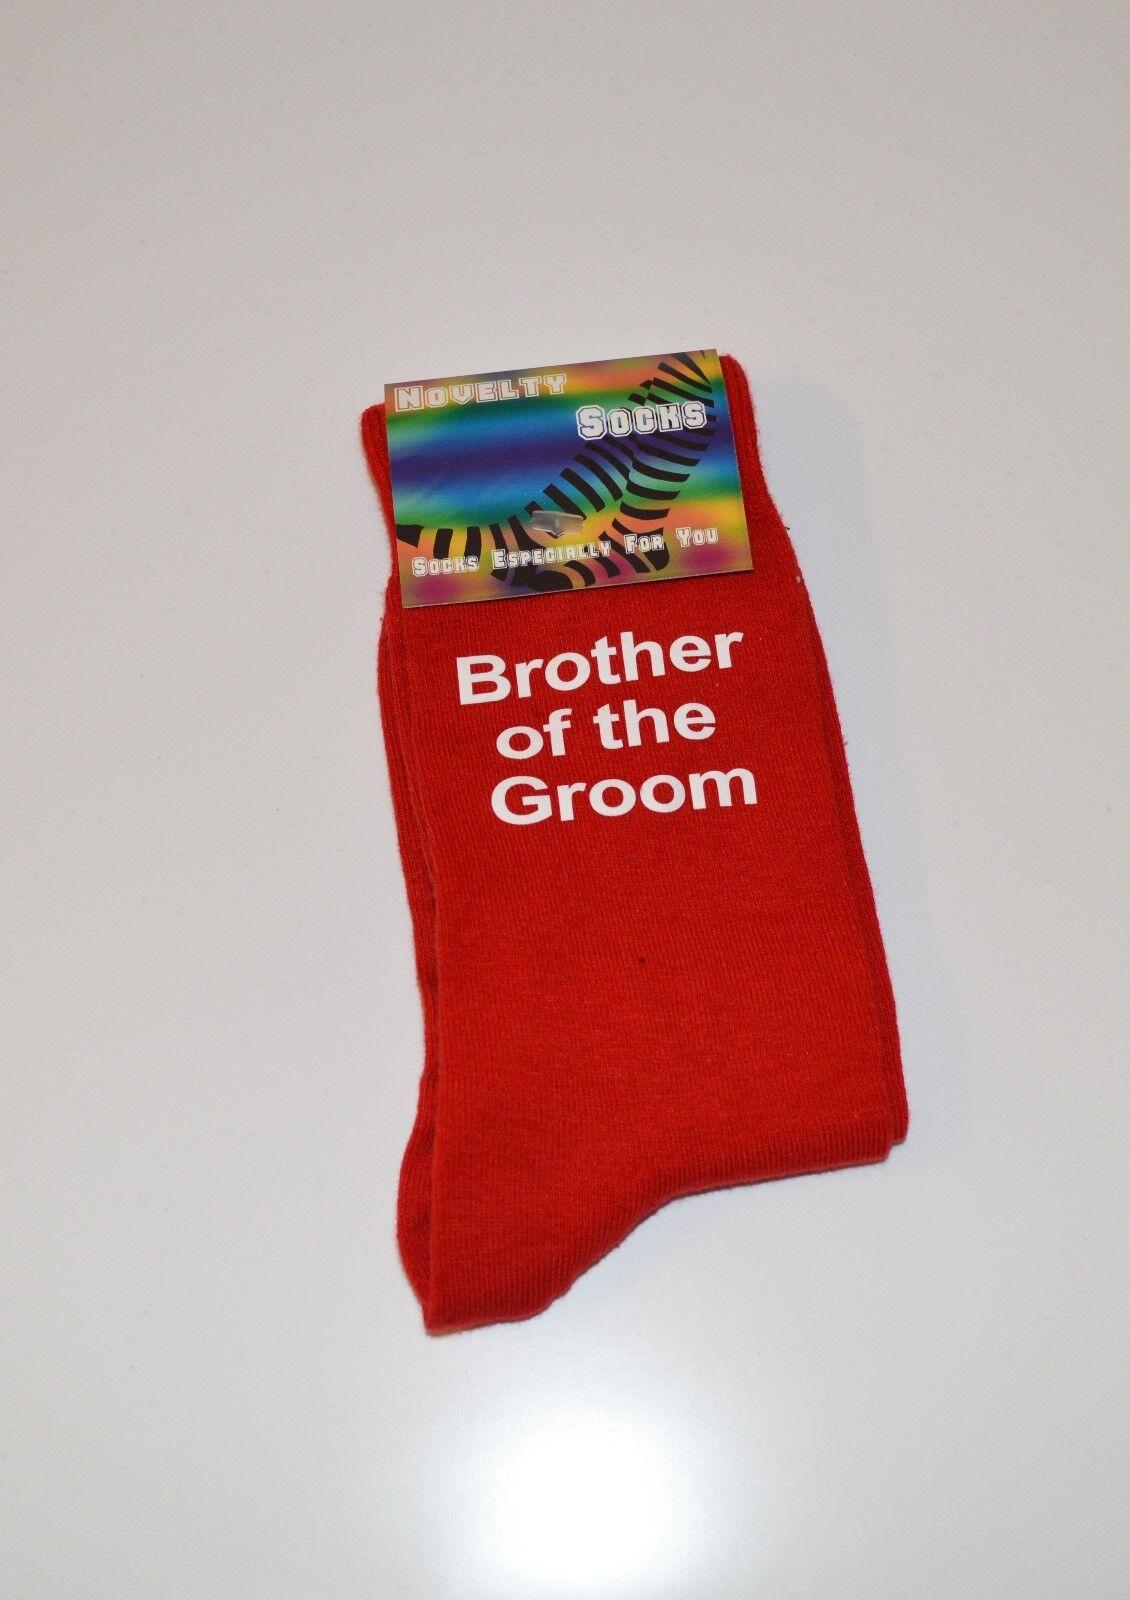 Brother Of The Groom On Red Socks - Socks Adult 5-12